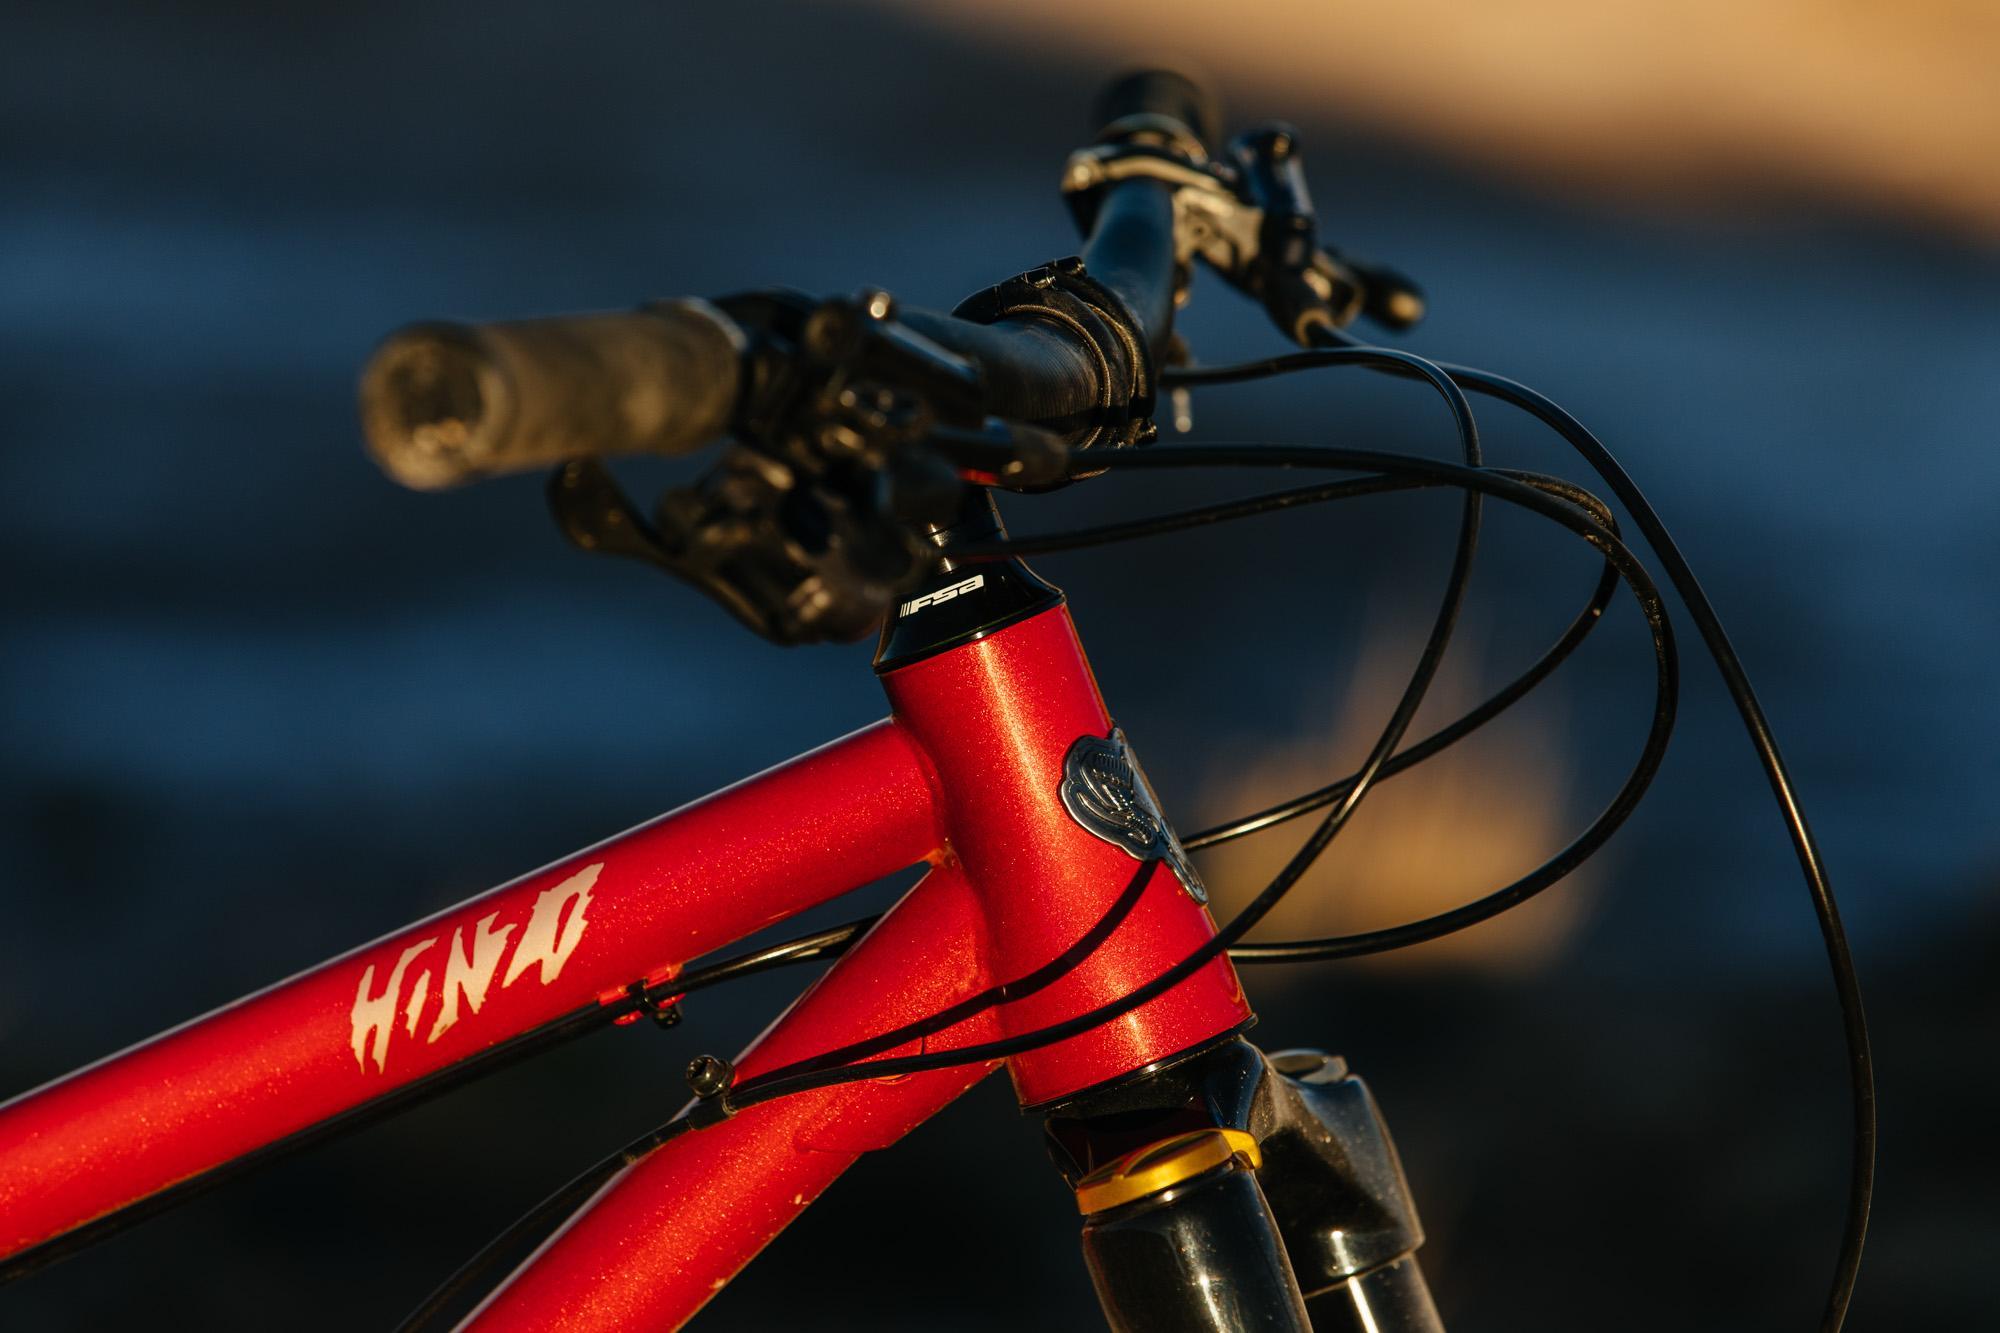 Kona's Honzo ESD